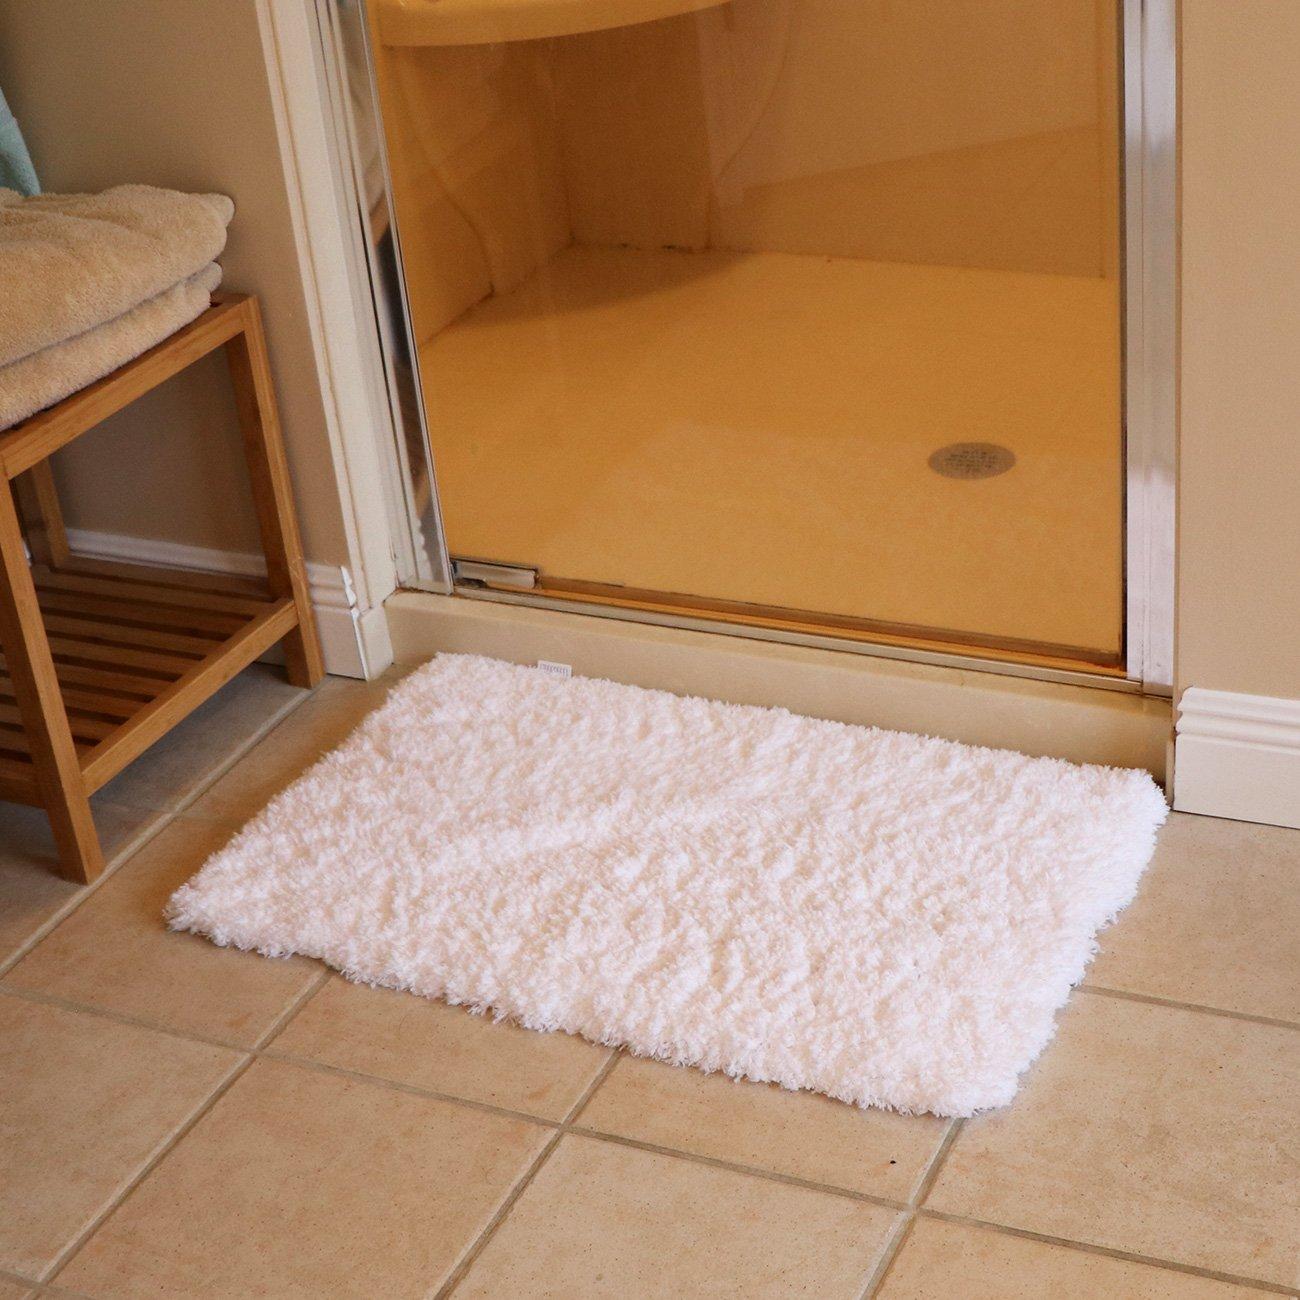 KMAT  Bath Mat 31'' x 19'' White Soft Plush Non Slip Absorbent Microfiber Bathroom and Shower Rugs Luxury Machine Washable Doormat Floor Mat For Bathroom Bathtub Bedroom Living Room Home Hotel